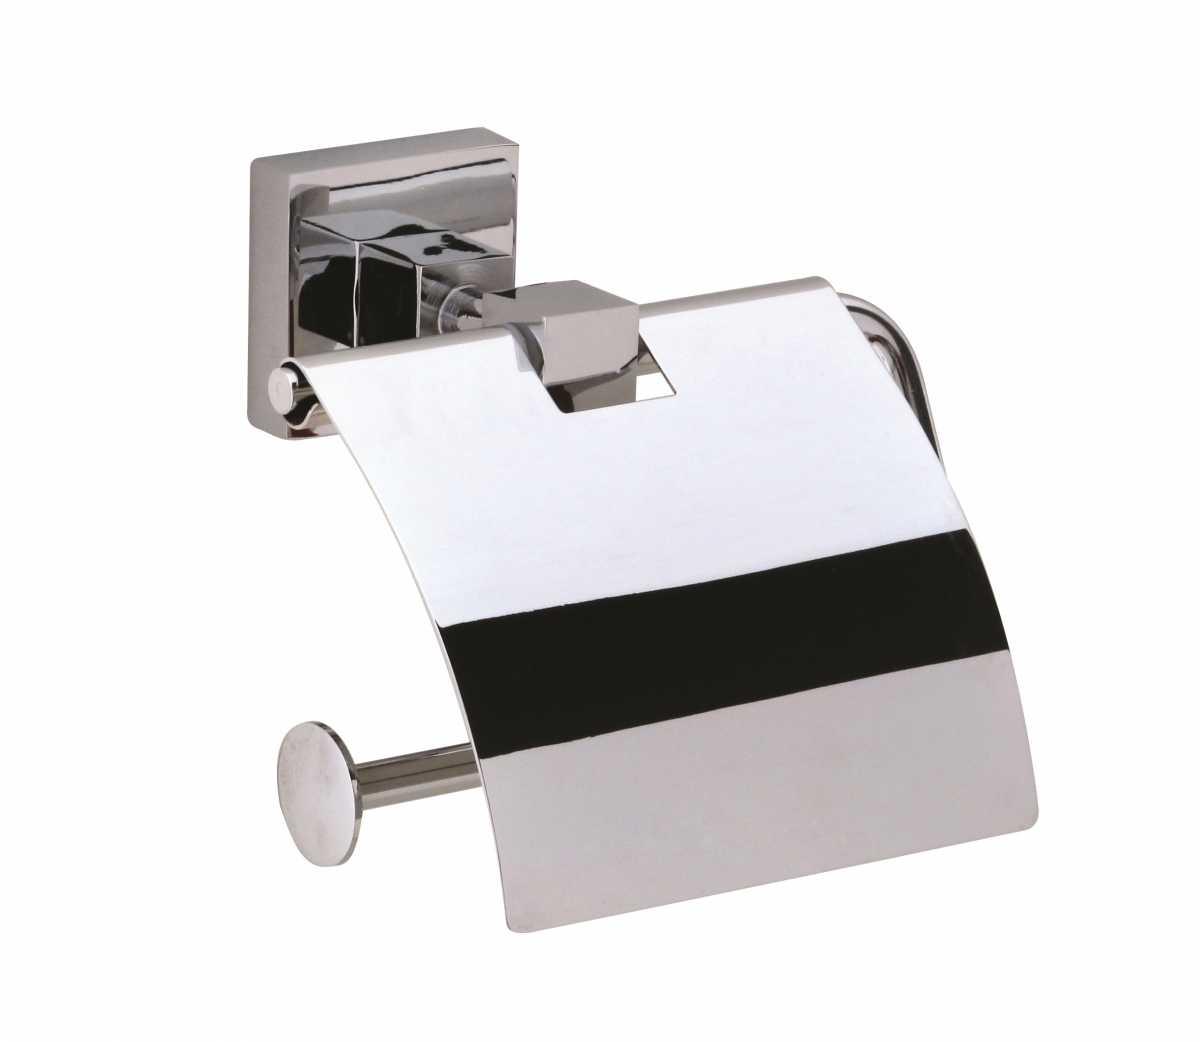 Mirage Kapaklı Tuvalet Kağıtlığı